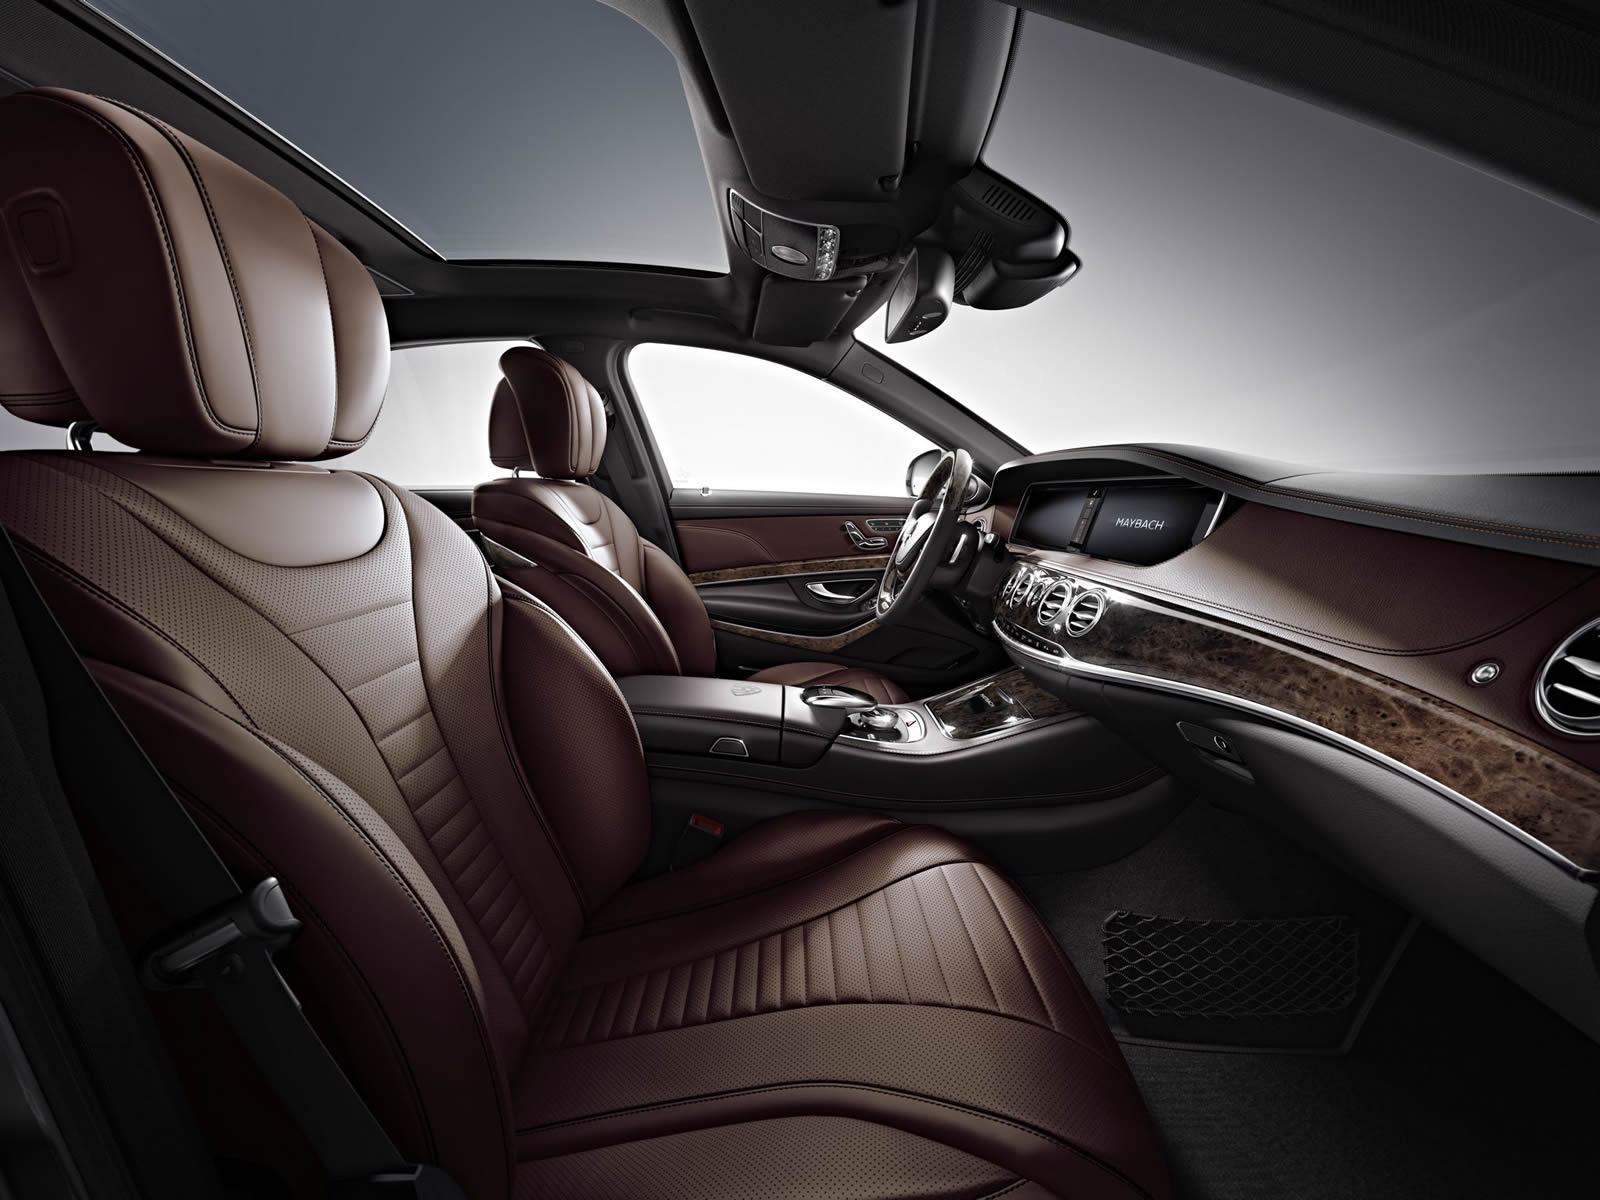 2016 Mercedes-Maybach S600 | Mercedes-Benz